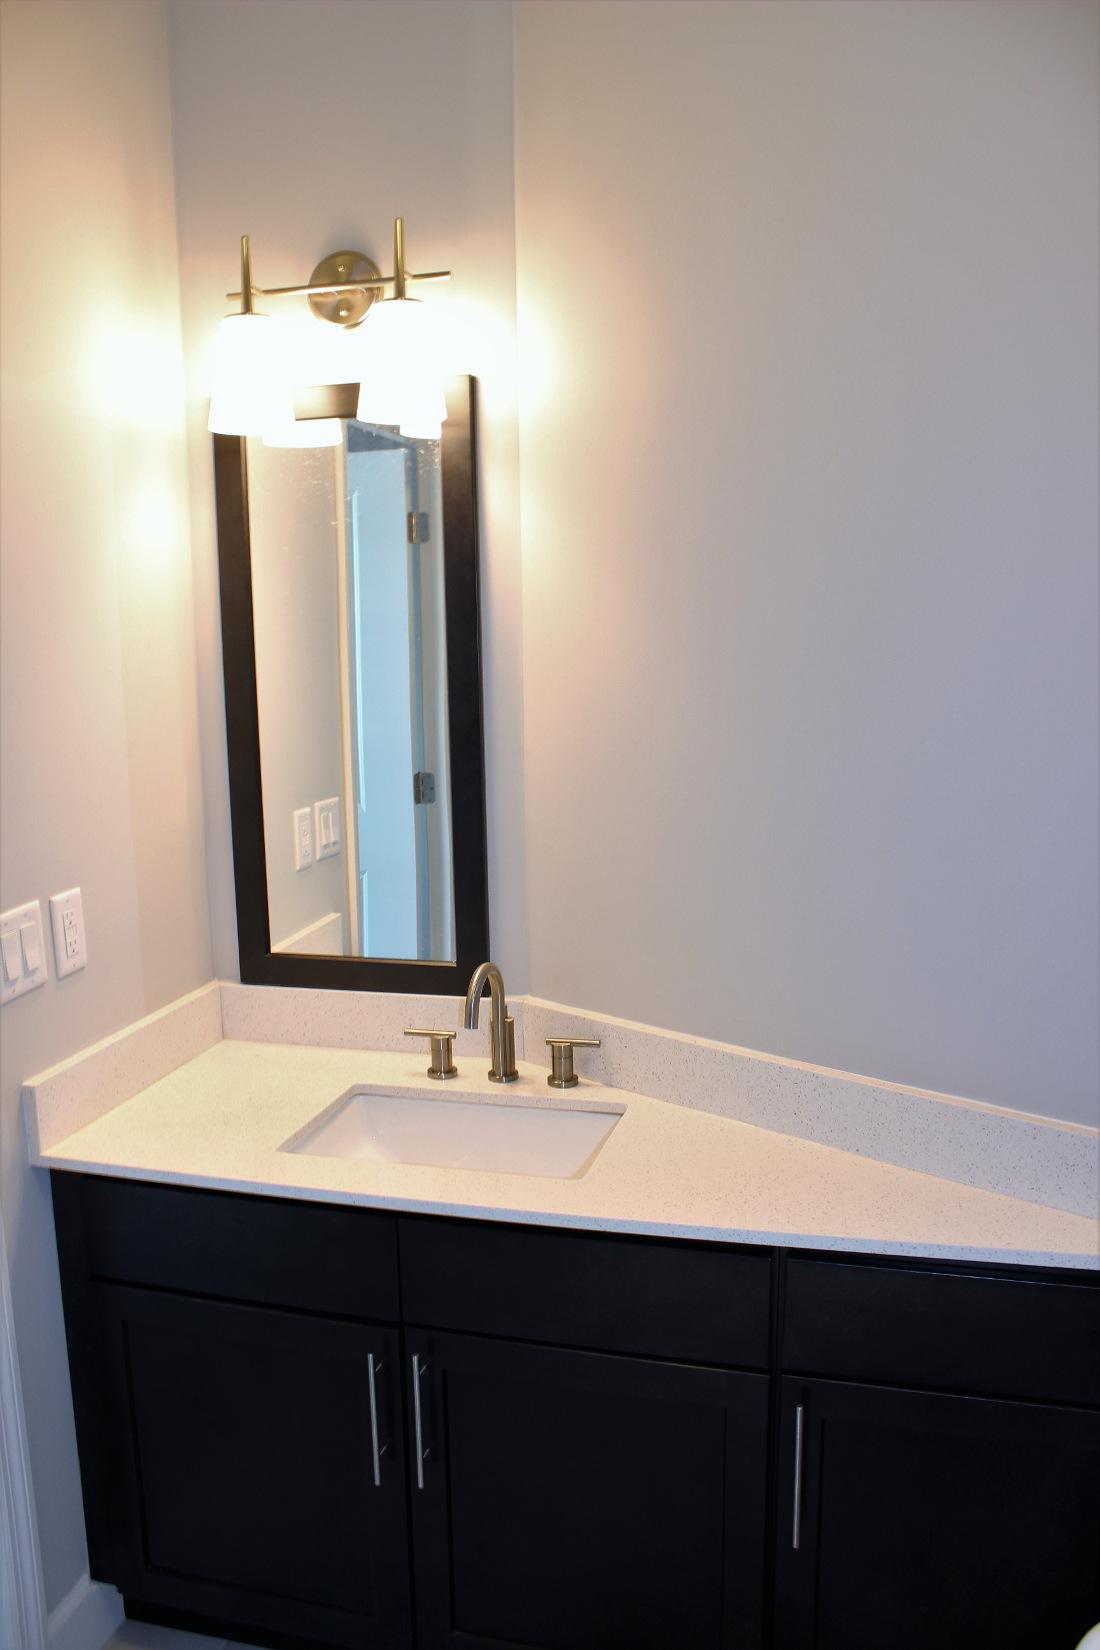 B1 Bathroom at the Vue at Creve Coeur Apartments in Creve Coeur, MO